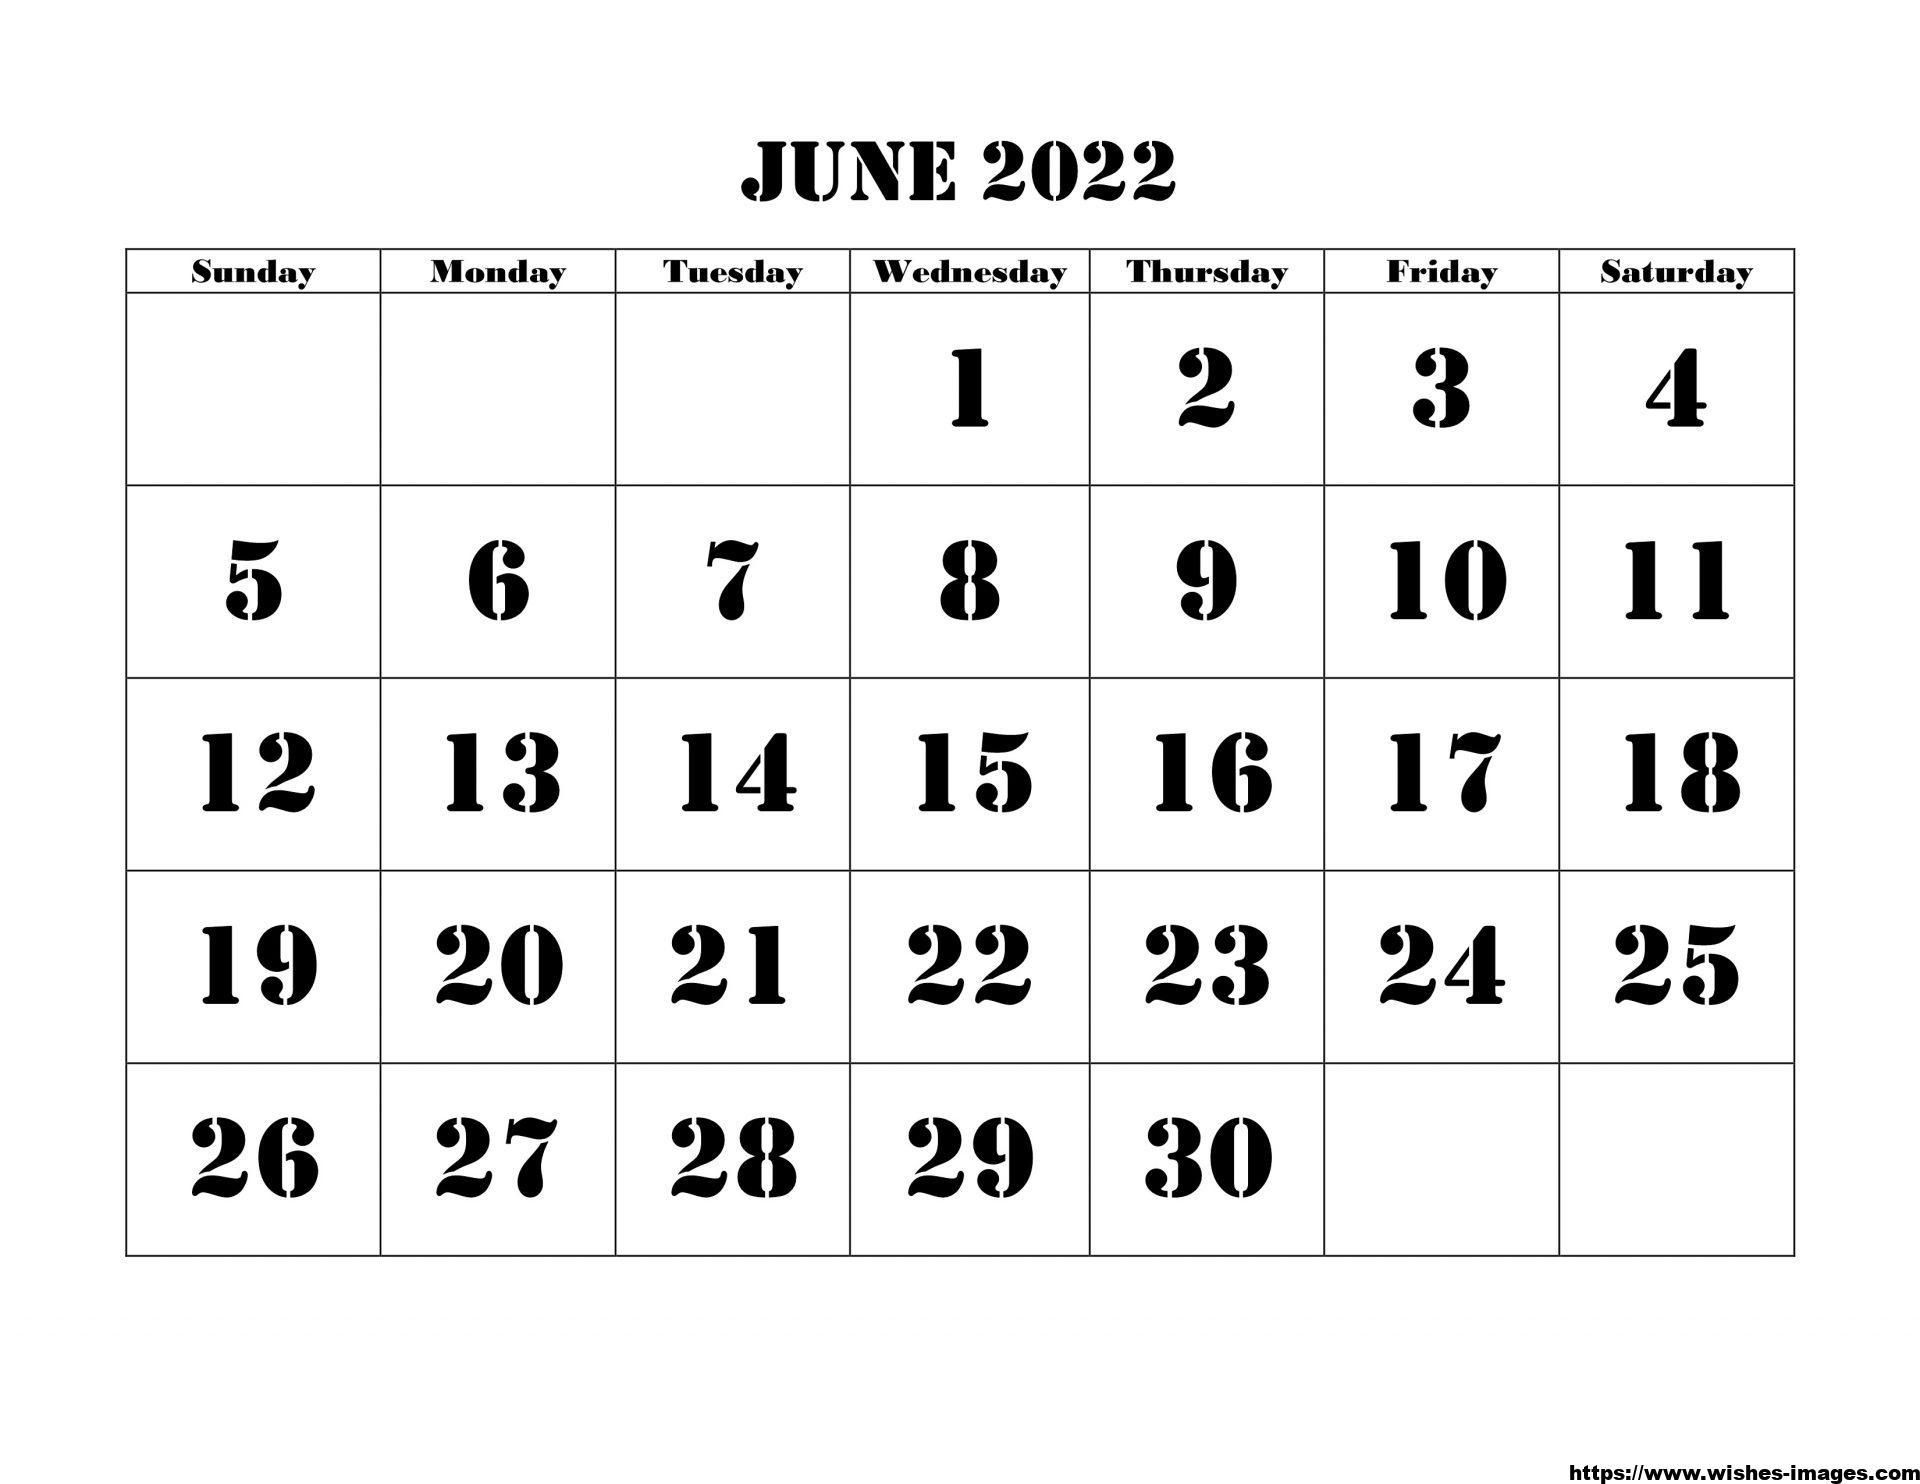 2022 Monthly Calendar Planner